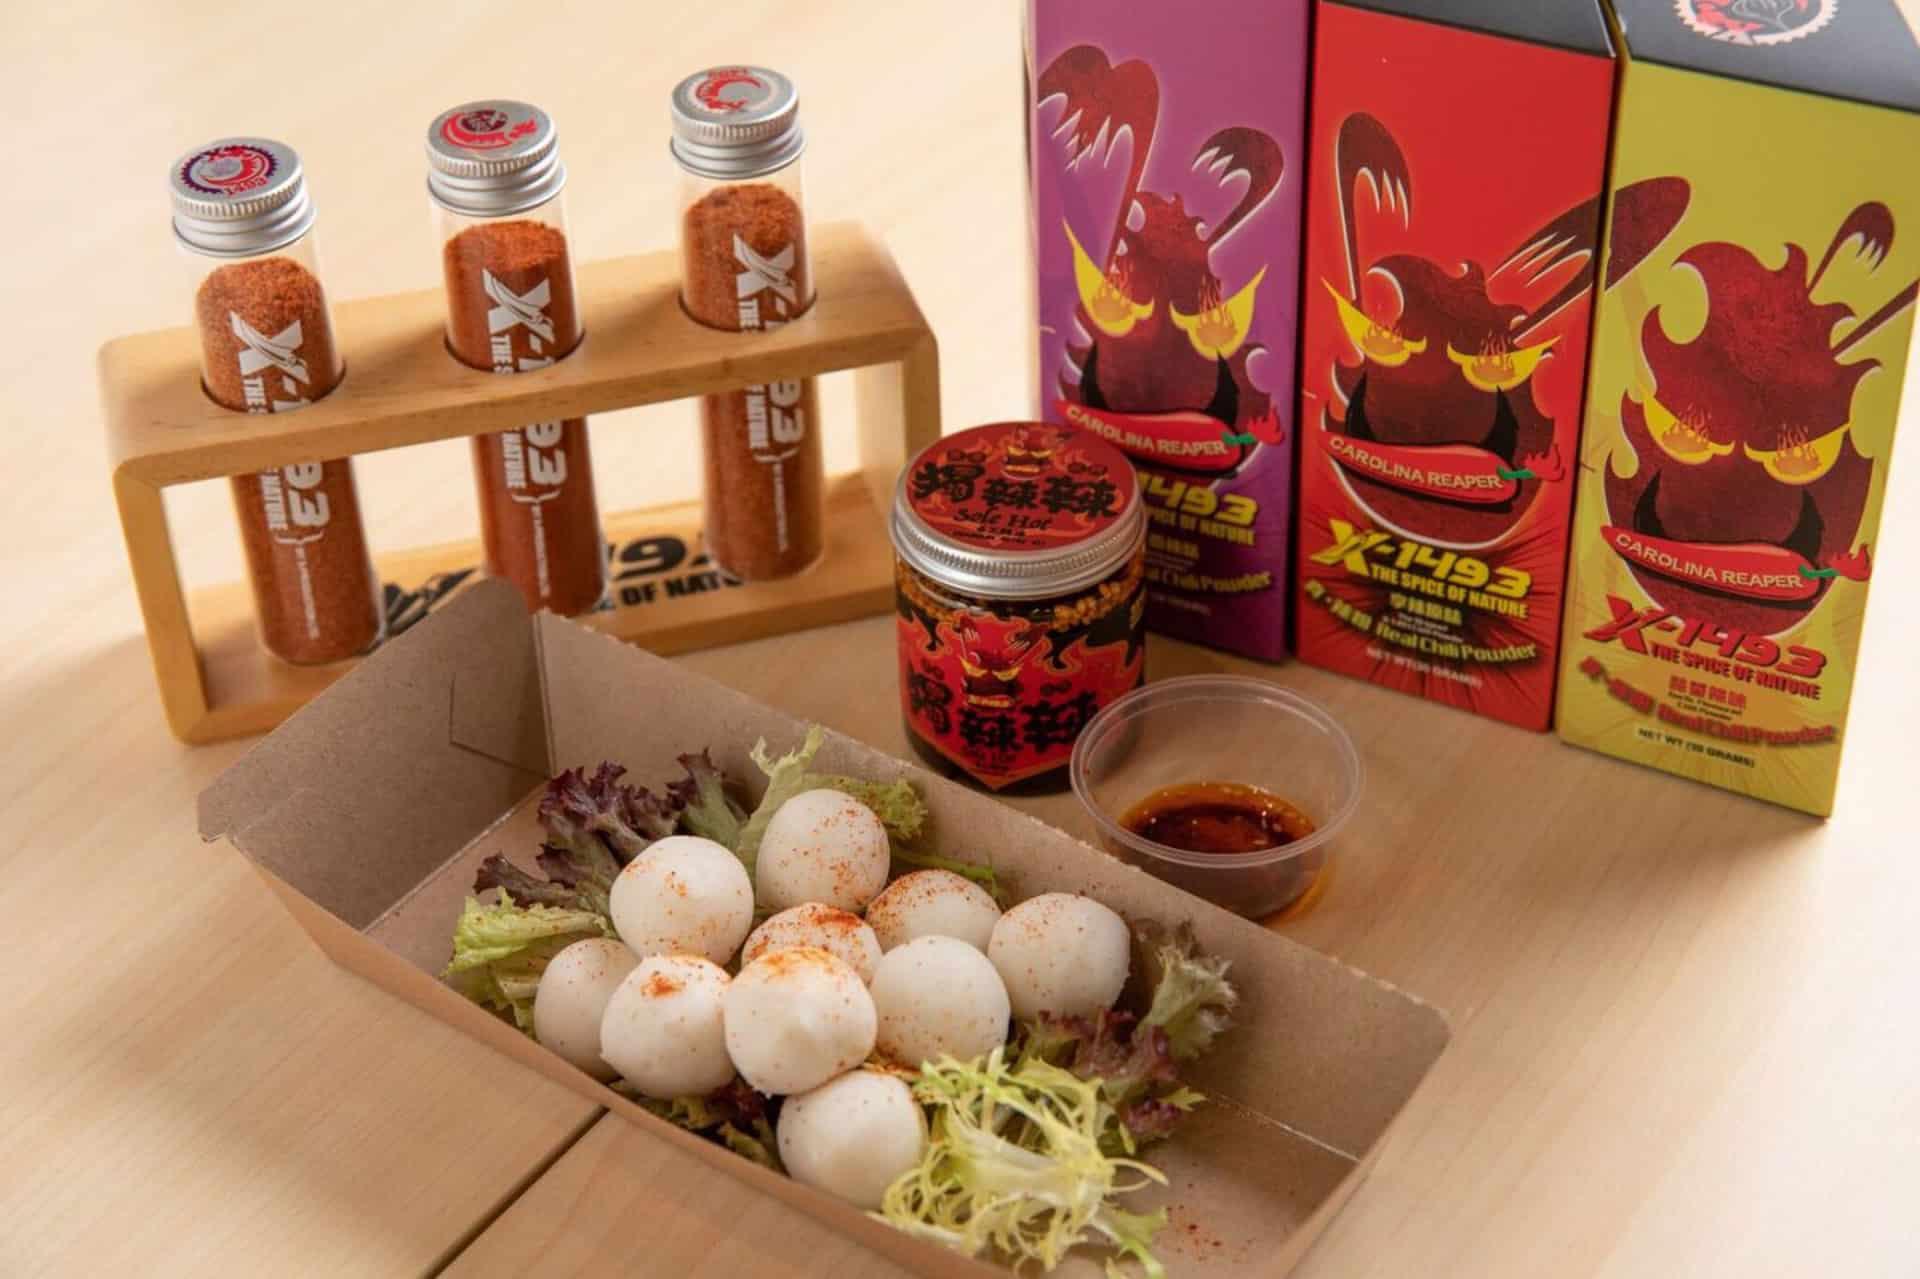 D.PARK愉景新城:冬日美食嘉年華 馬來西亞魚蛋配自家製X-1493萬度辣油(港幣$48)